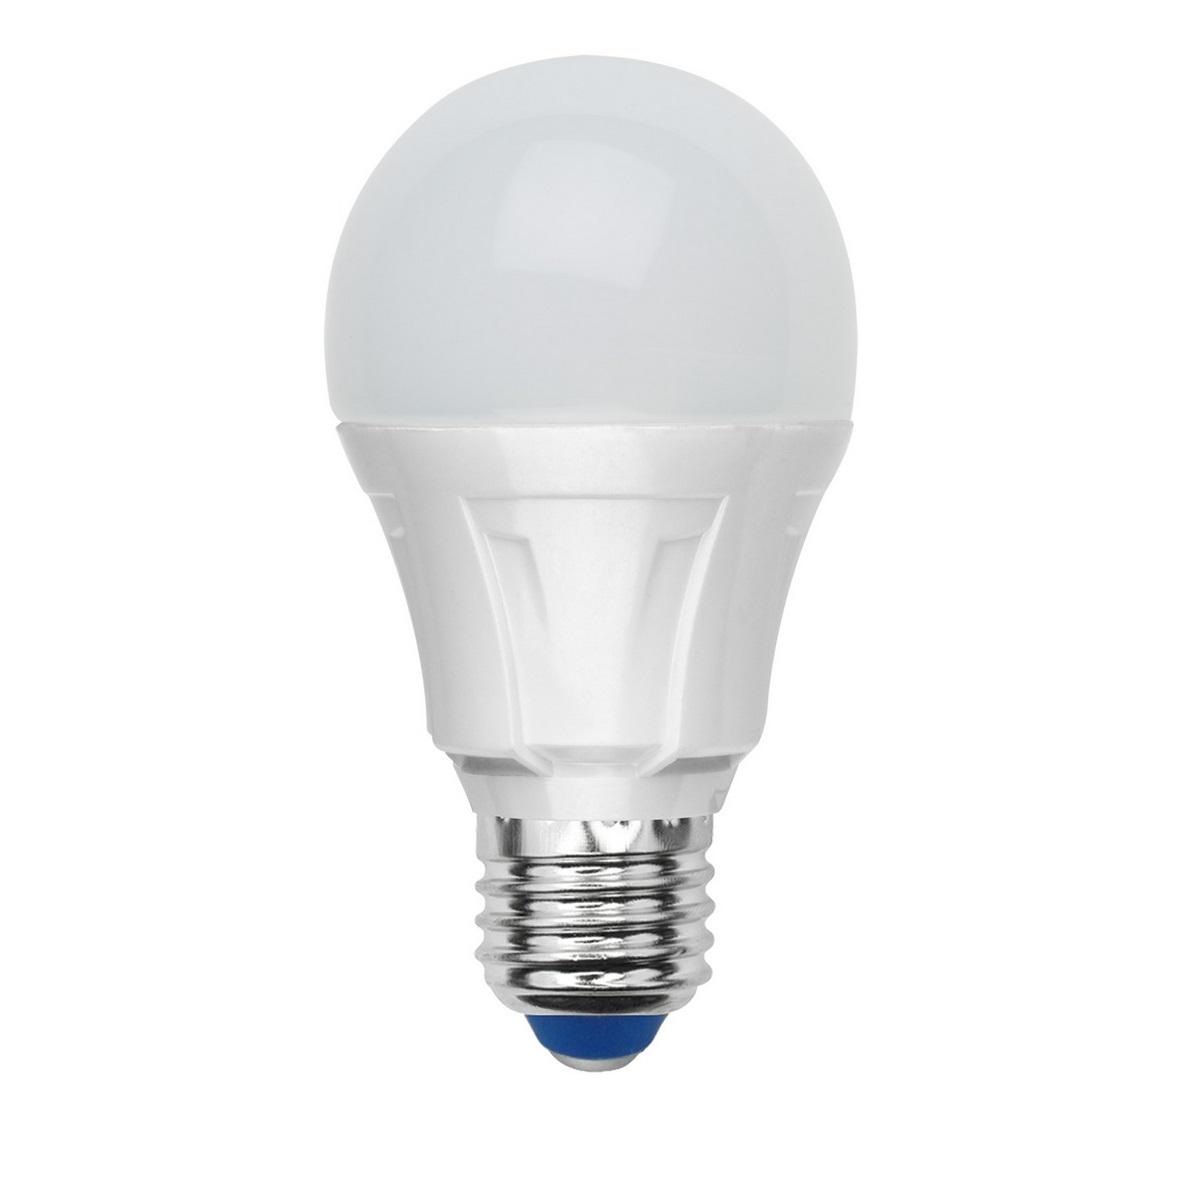 Купить Лампа светодиодная Volpe Led-a60-11w/ww/e27/fr/s 10шт